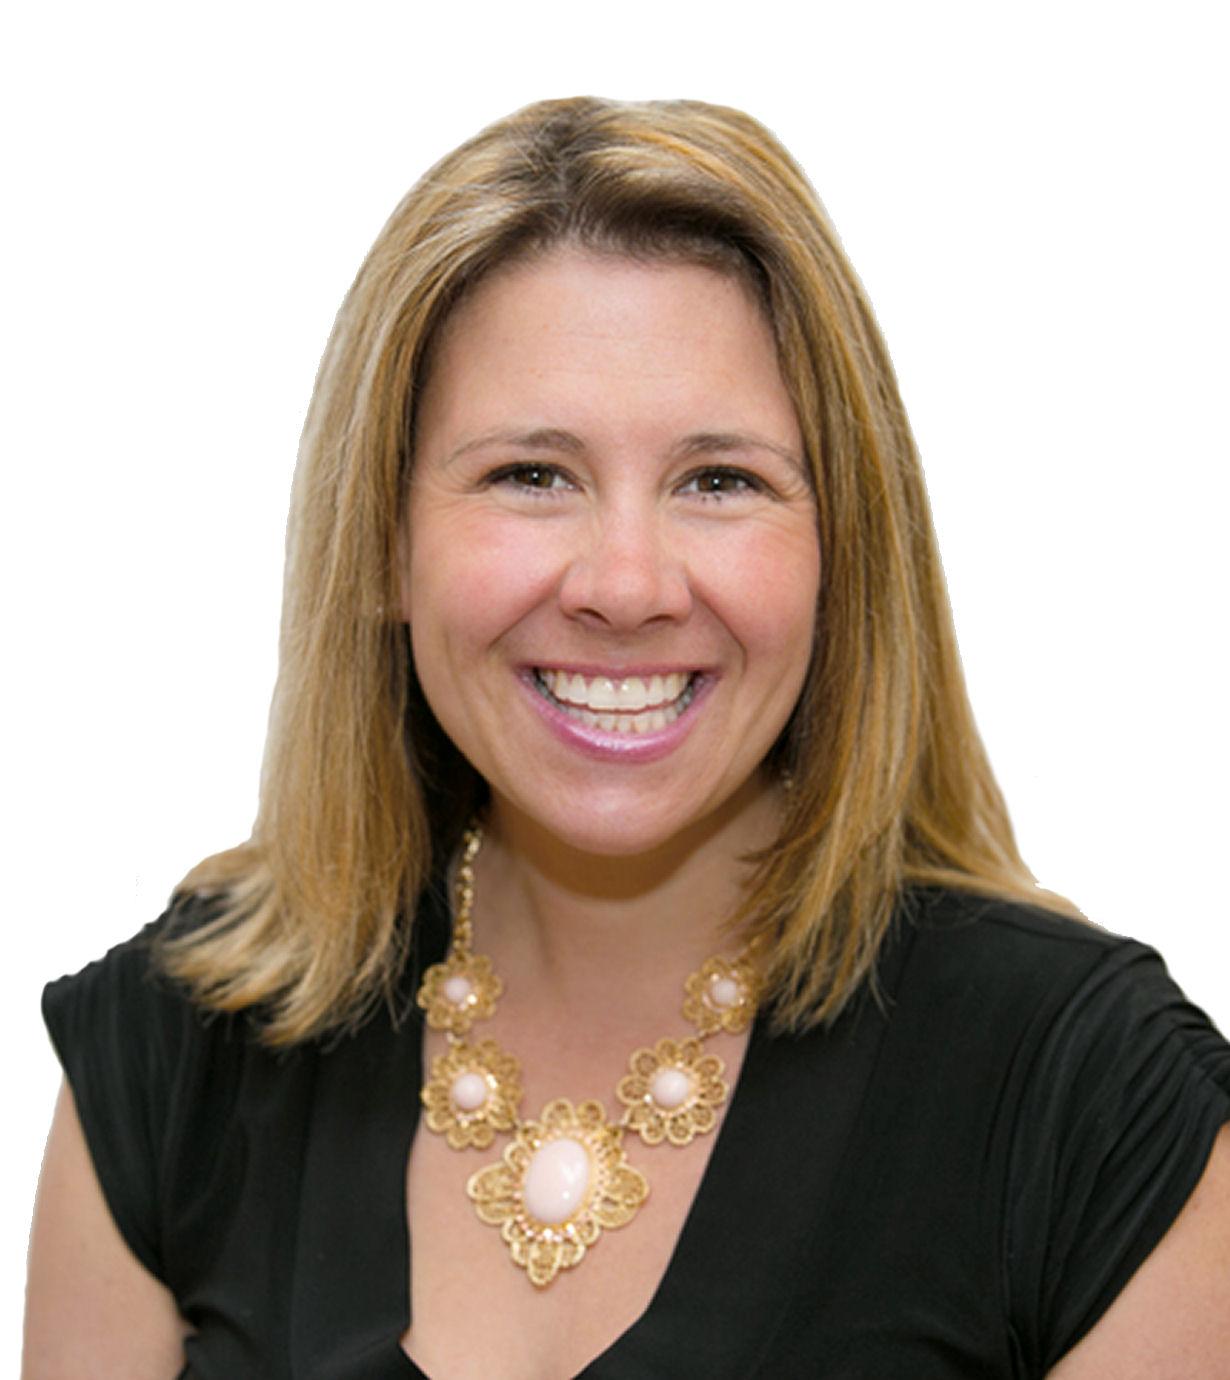 Lauren Maguire - The Kim Perrotti Team - Leading Edge Real Estate